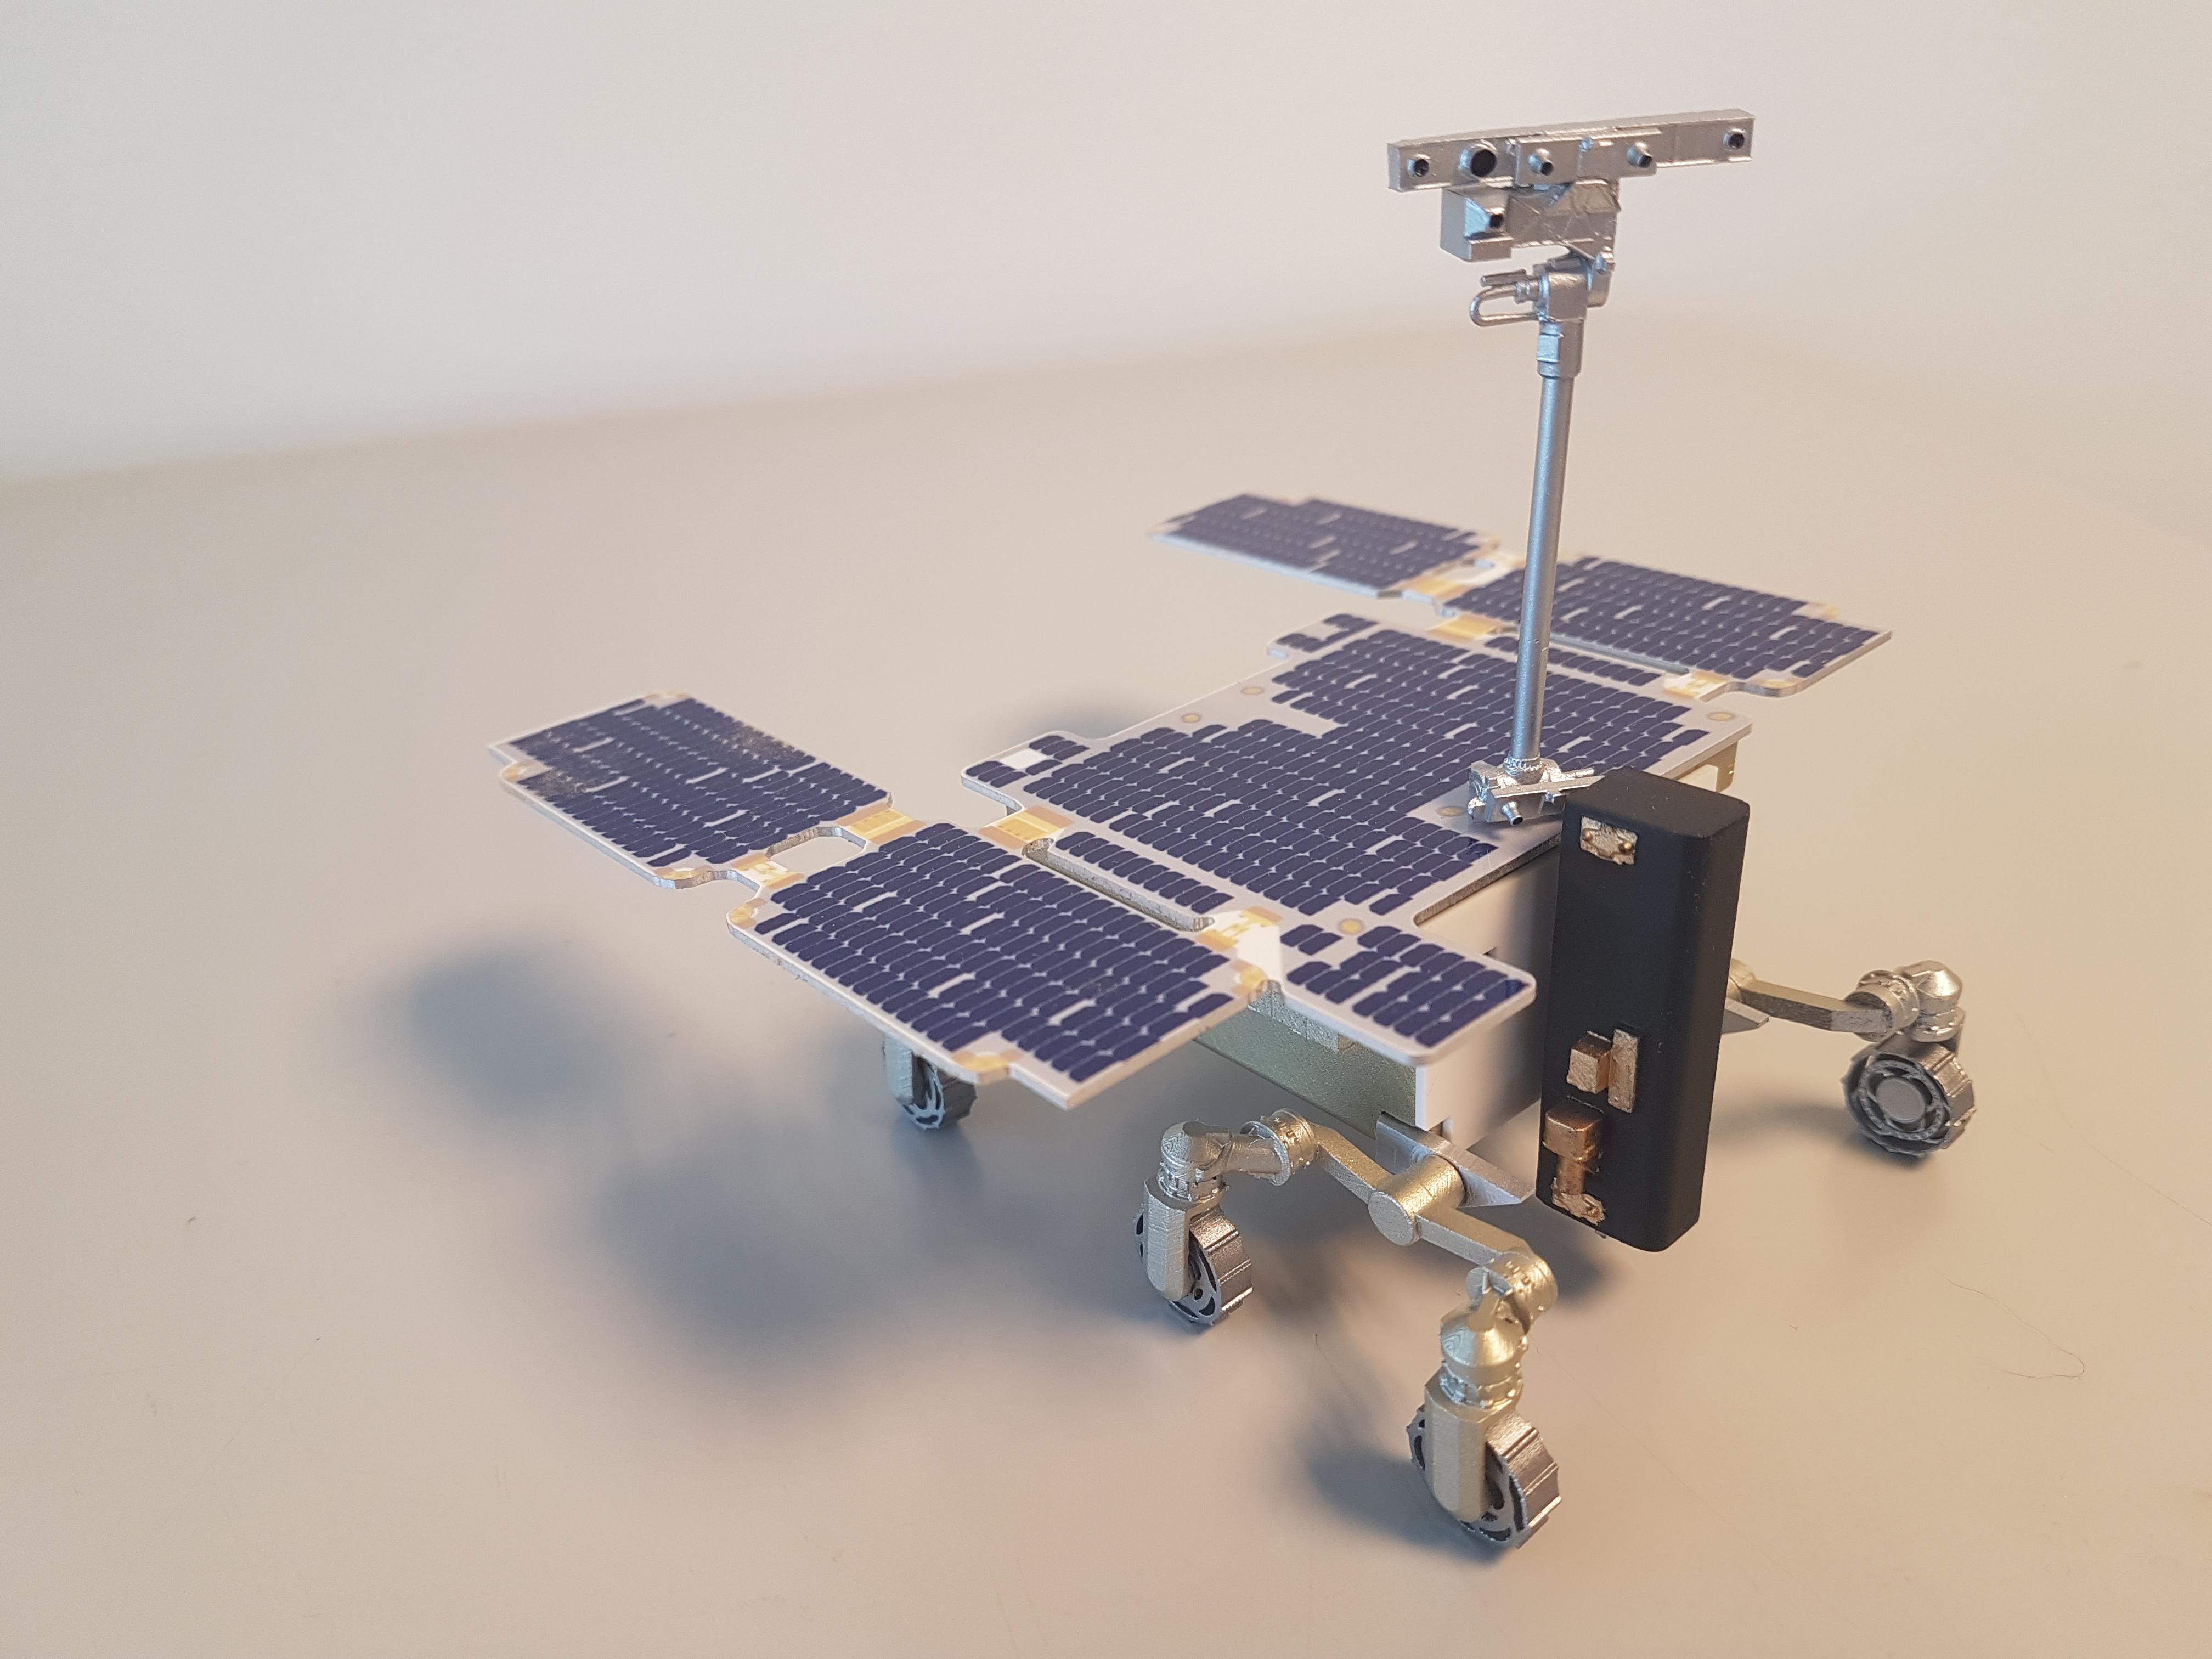 Exomars Rover 1:20 space model 3D printed